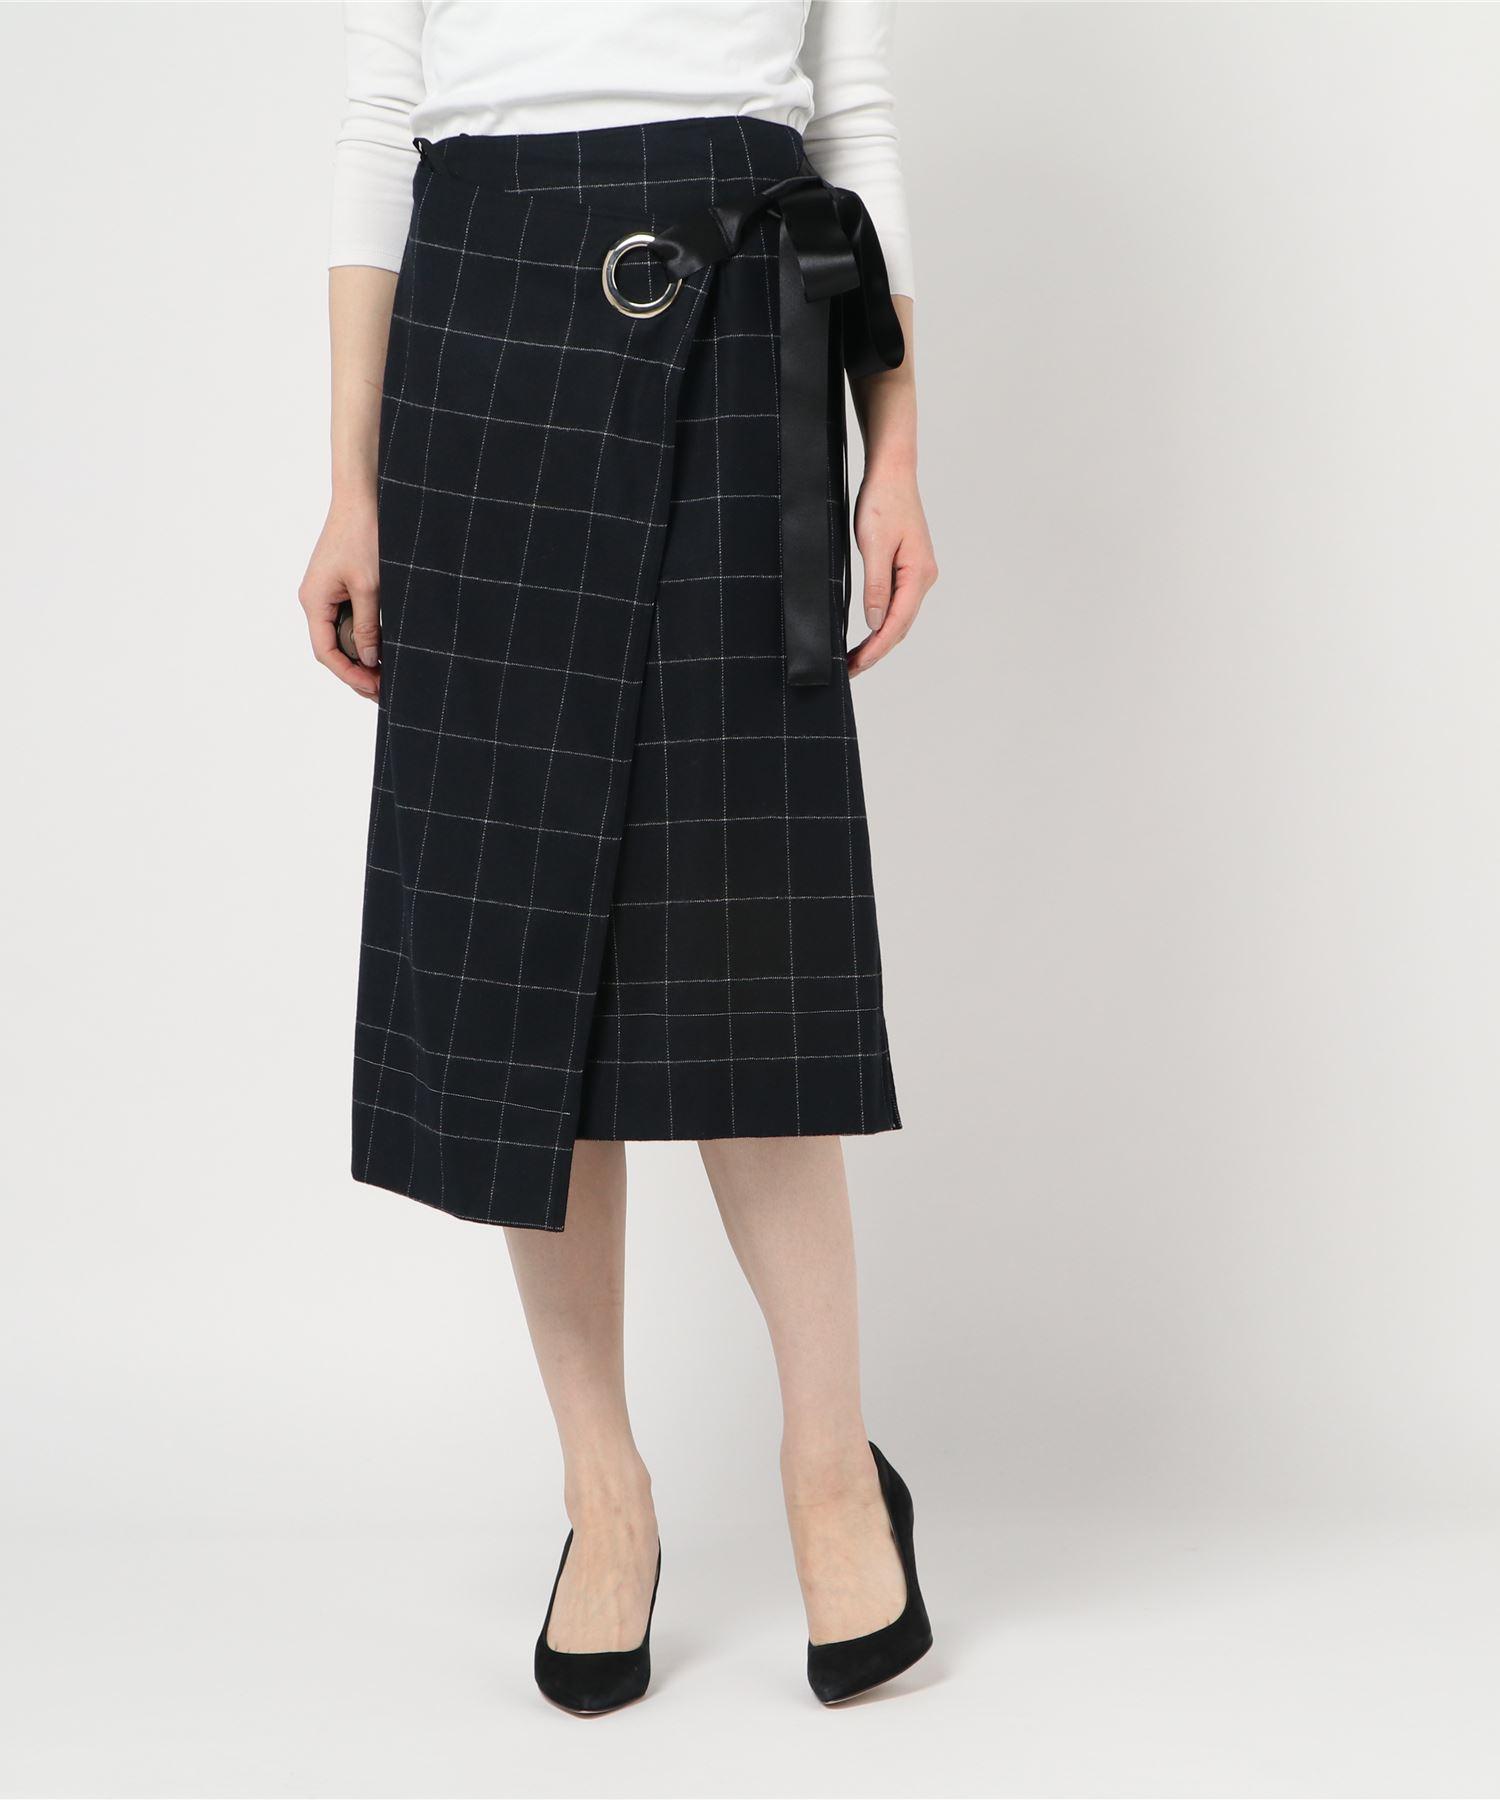 ELIZABETH AND JAMES エリザベスアンドジェームス / チェック 巻きスカート